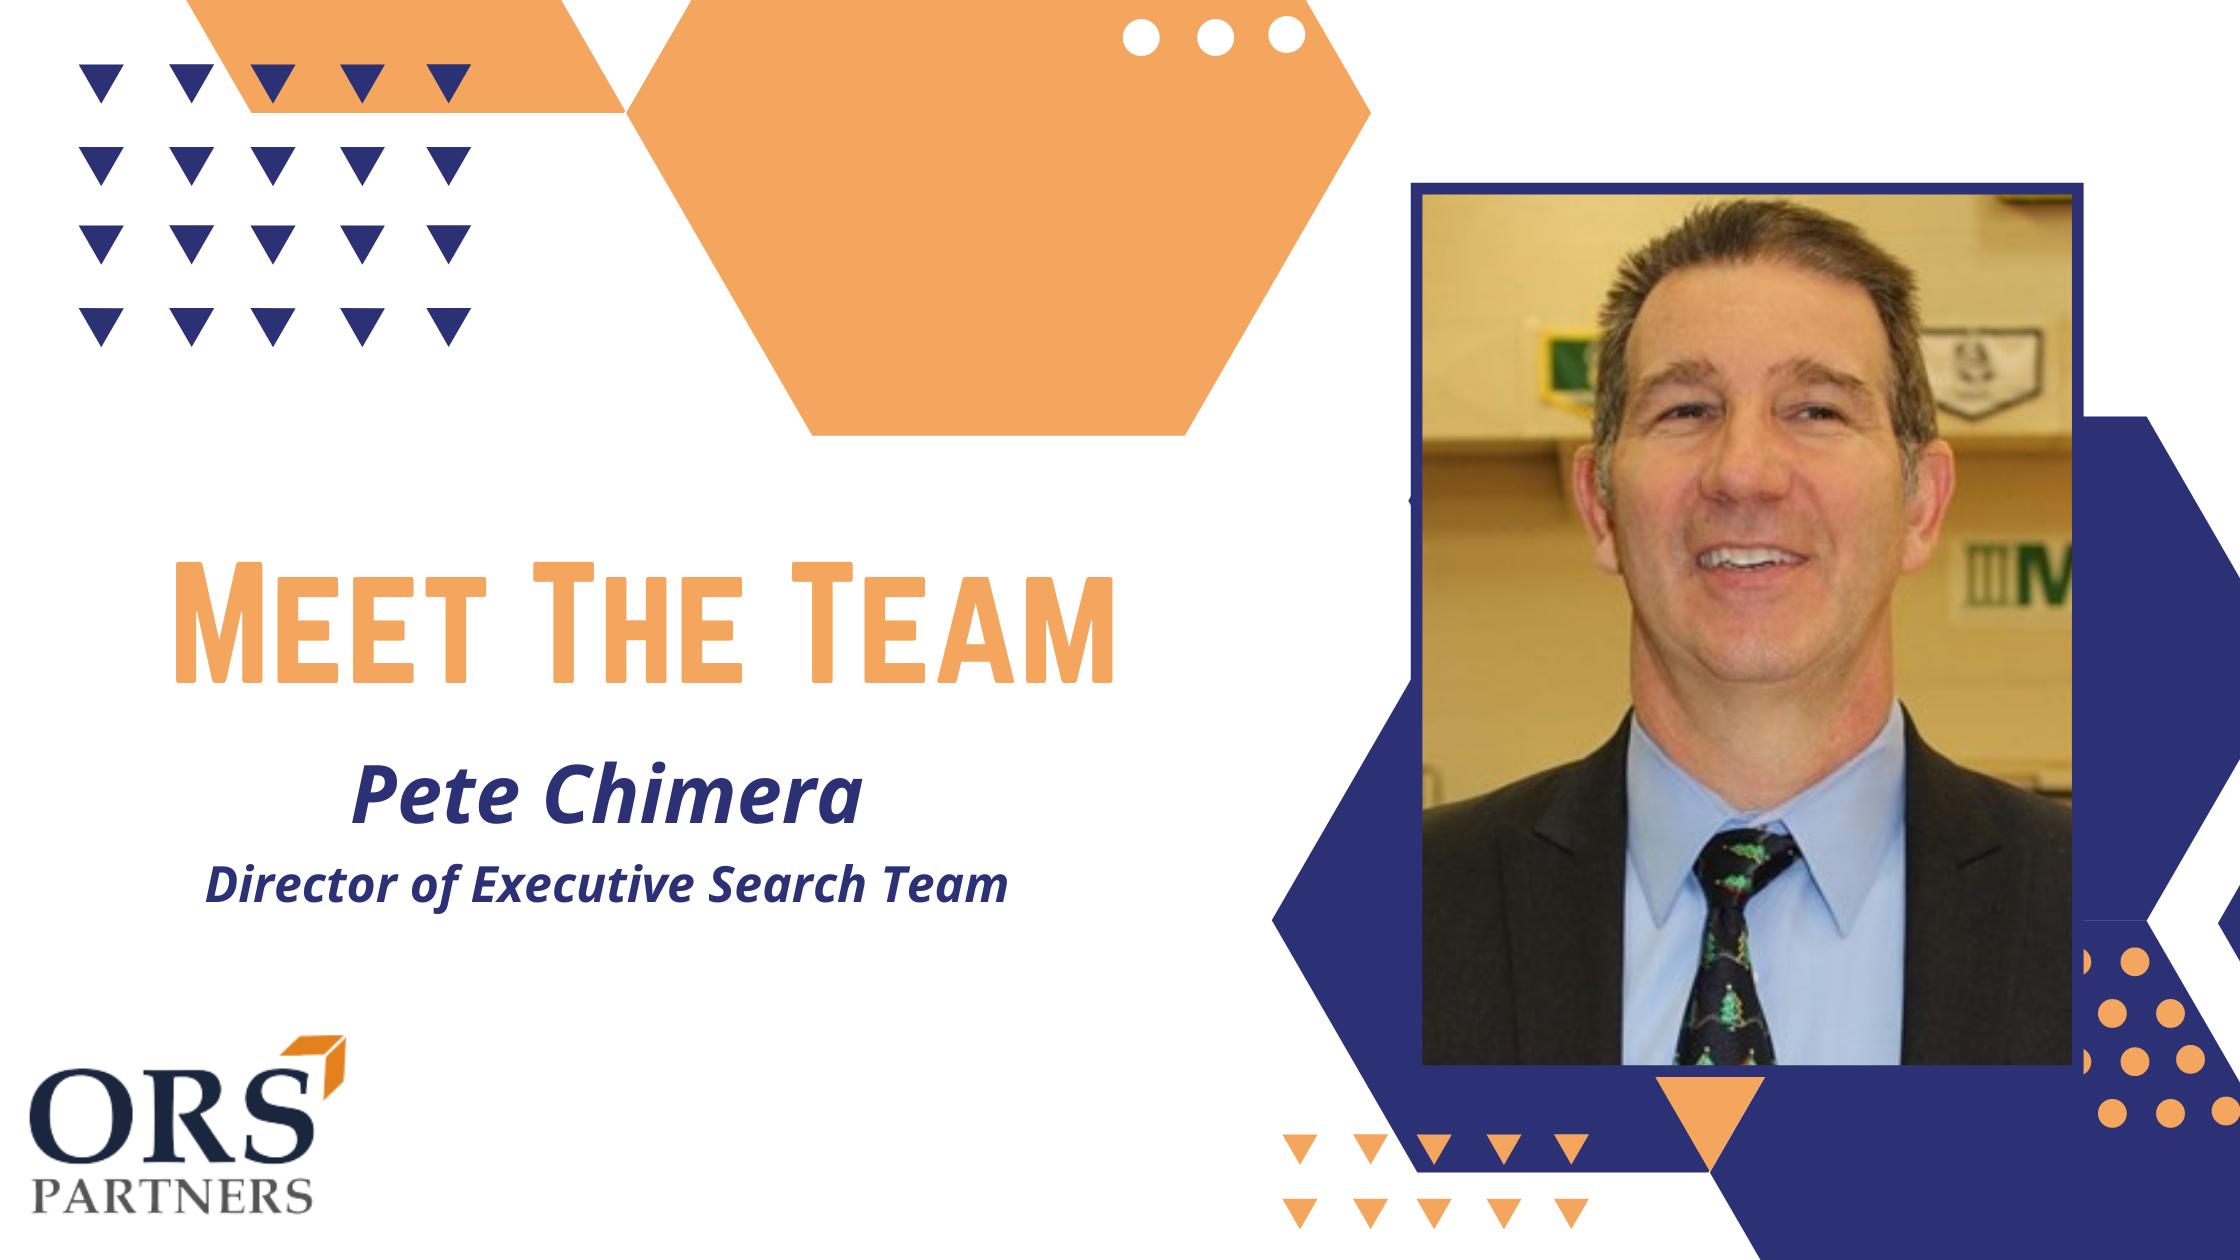 Meet the Team: Pete Chimera